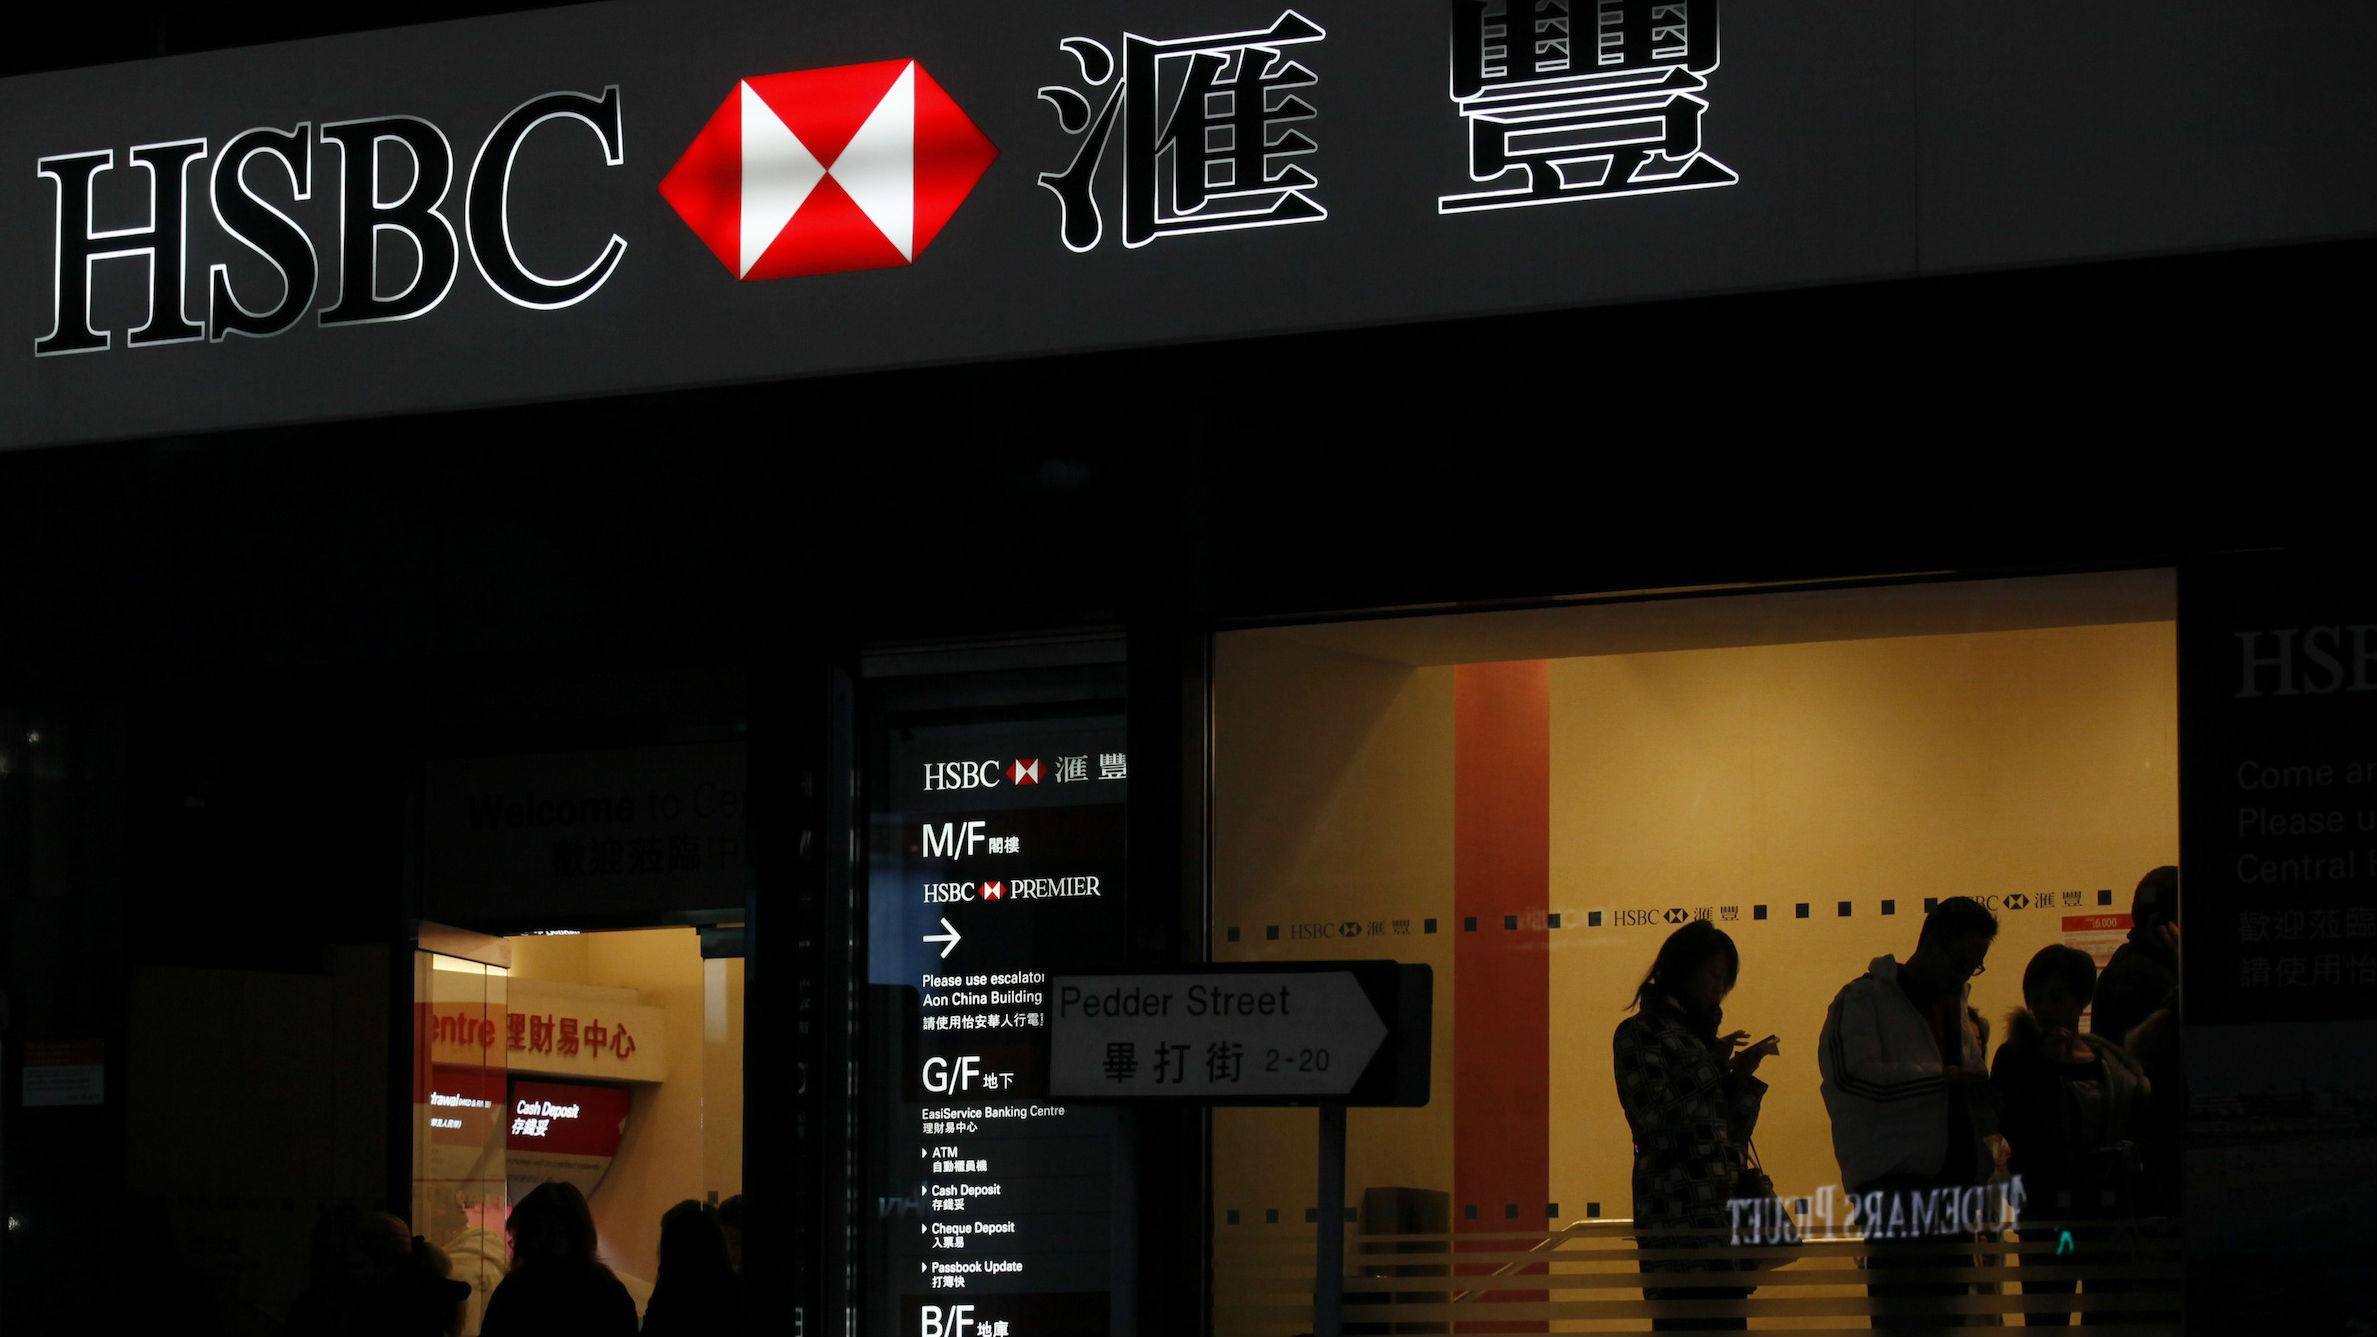 HSBC 2 web